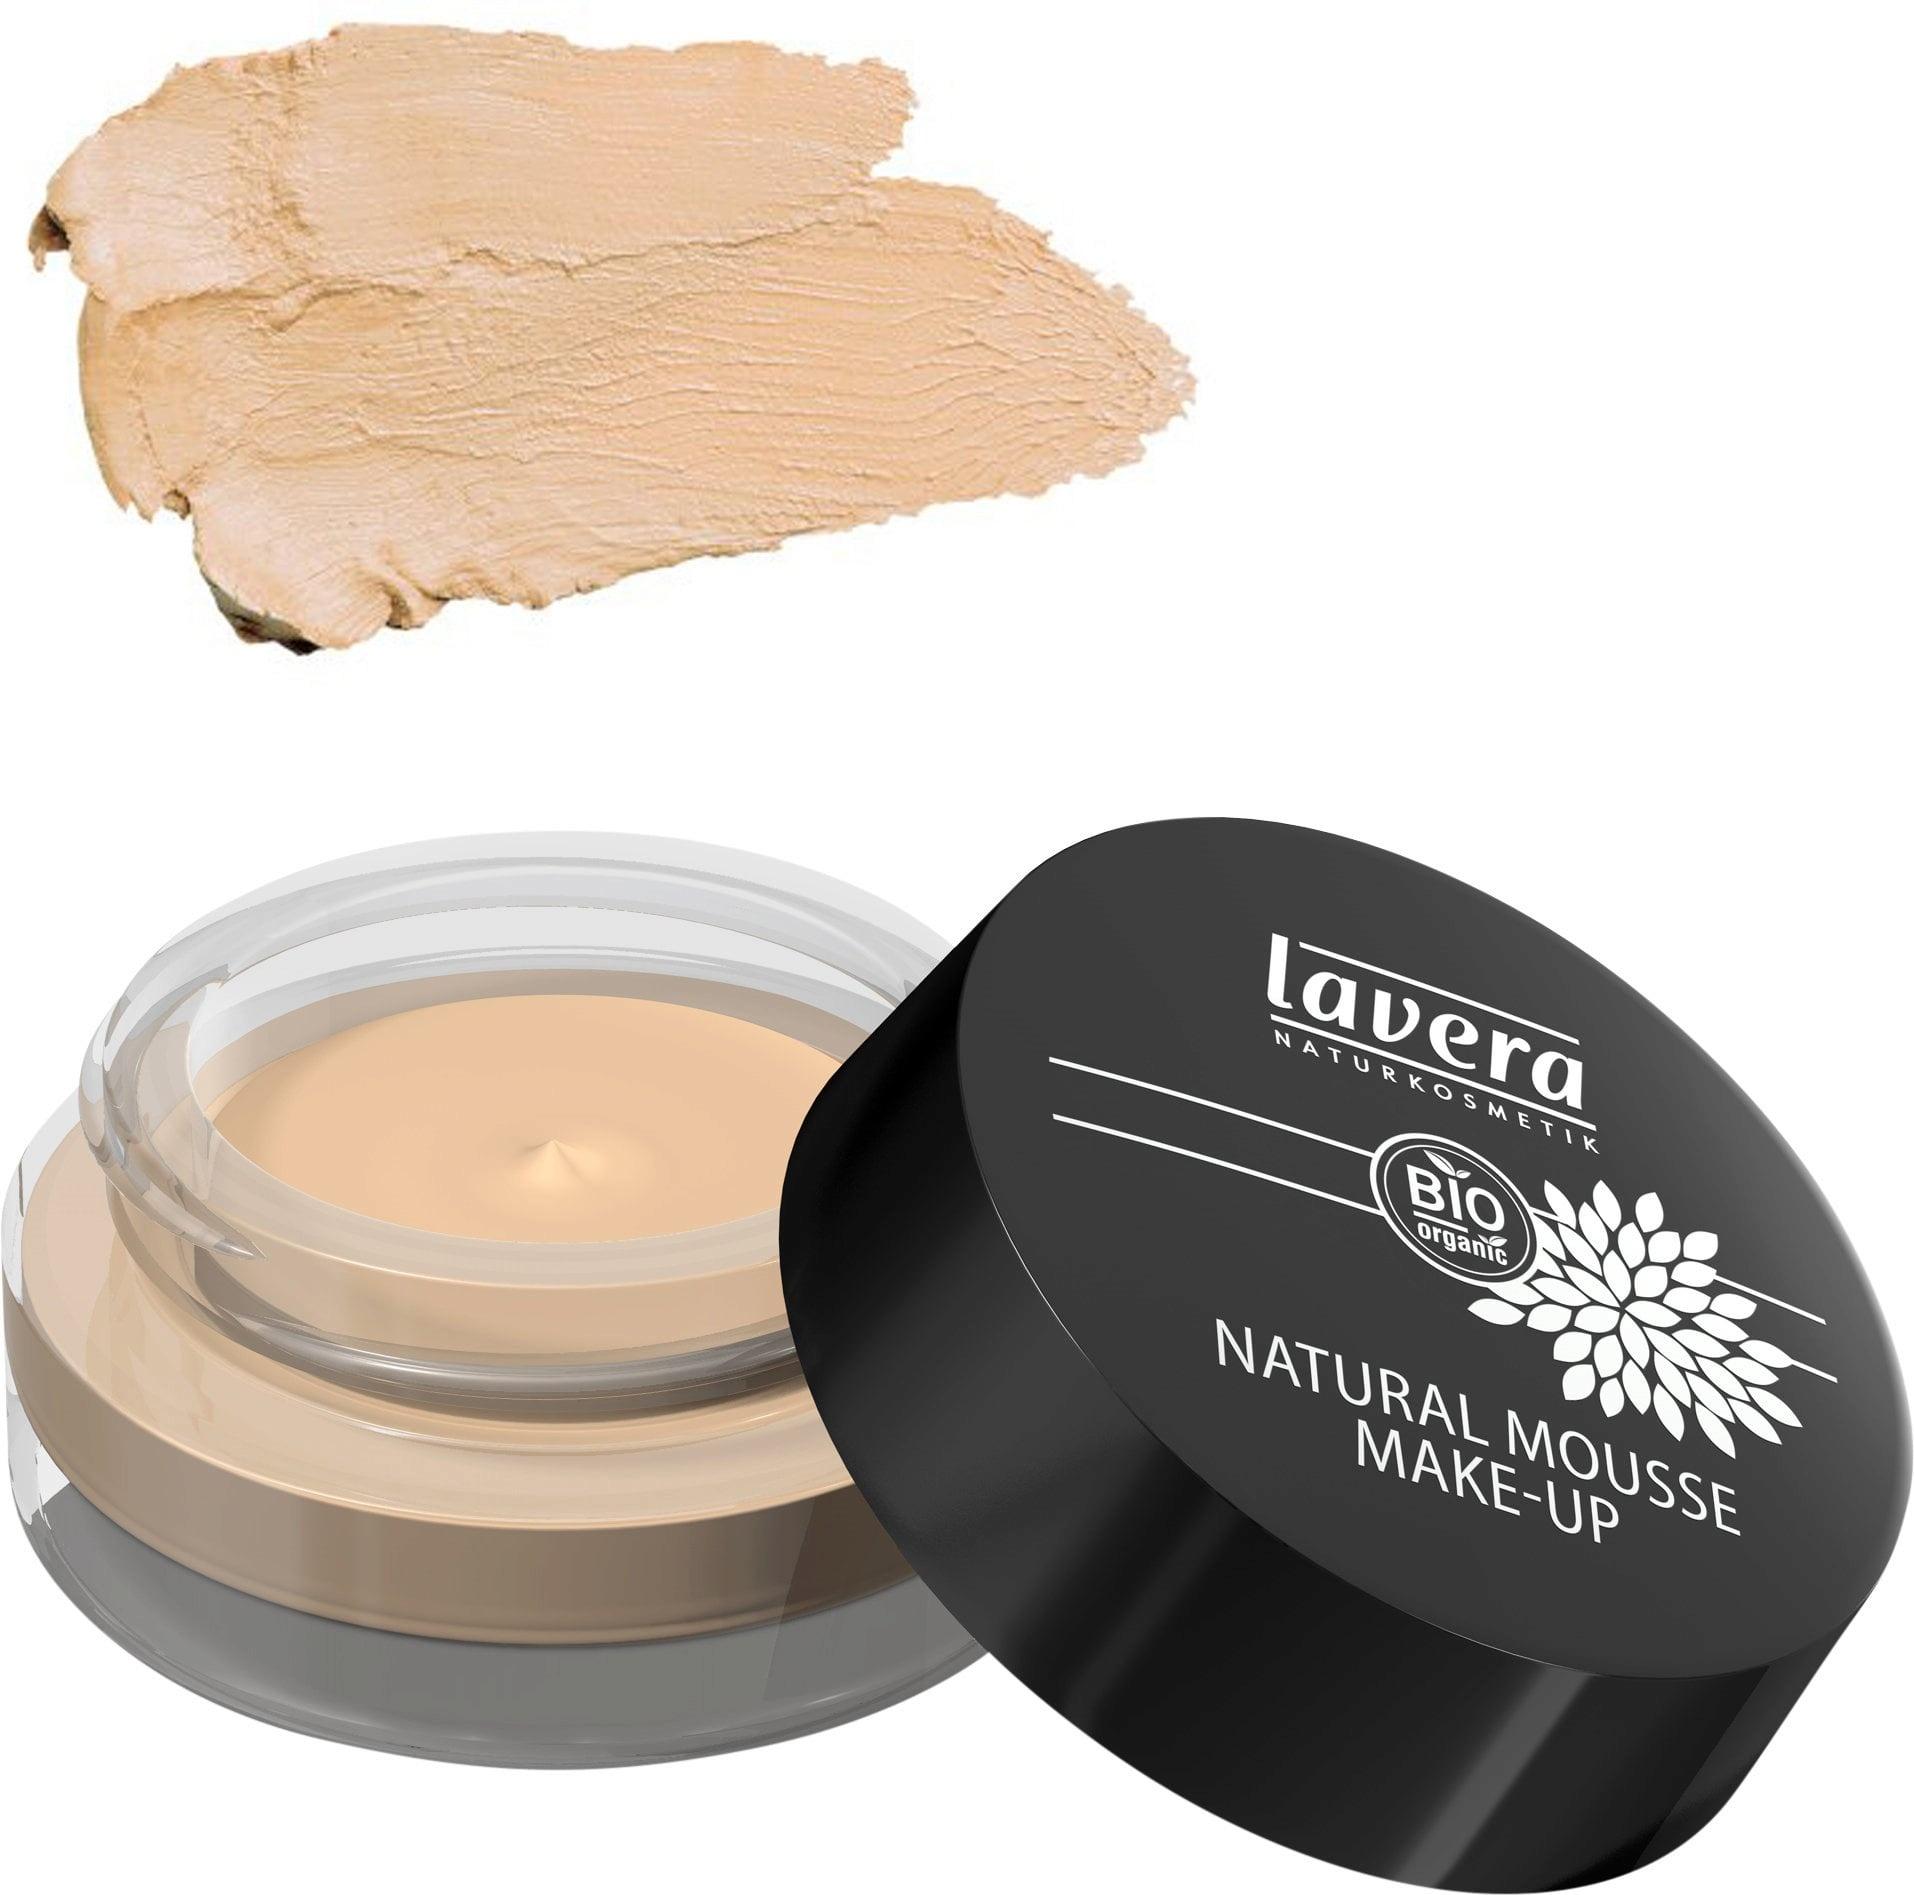 Lavera Trend Natural Mousse Make Up Ivory 01, 15g